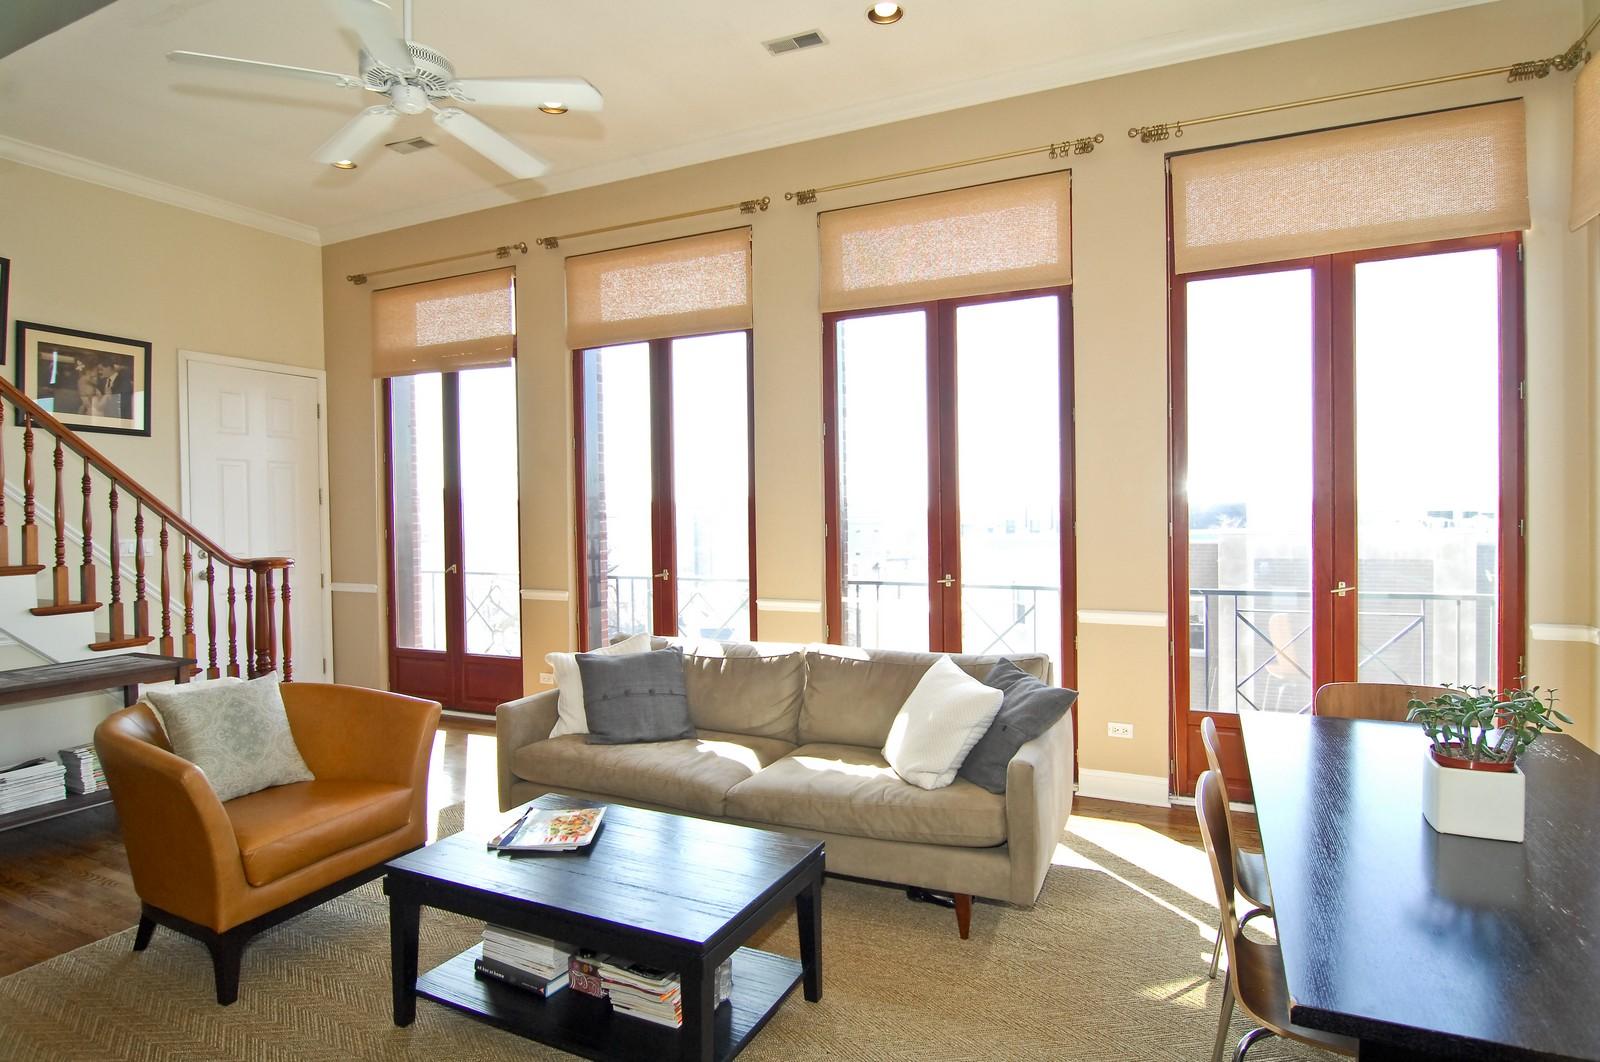 Real Estate Photography - 1865 N Winnebago, Unit 4, Chicago, IL, 60647 - Location 1